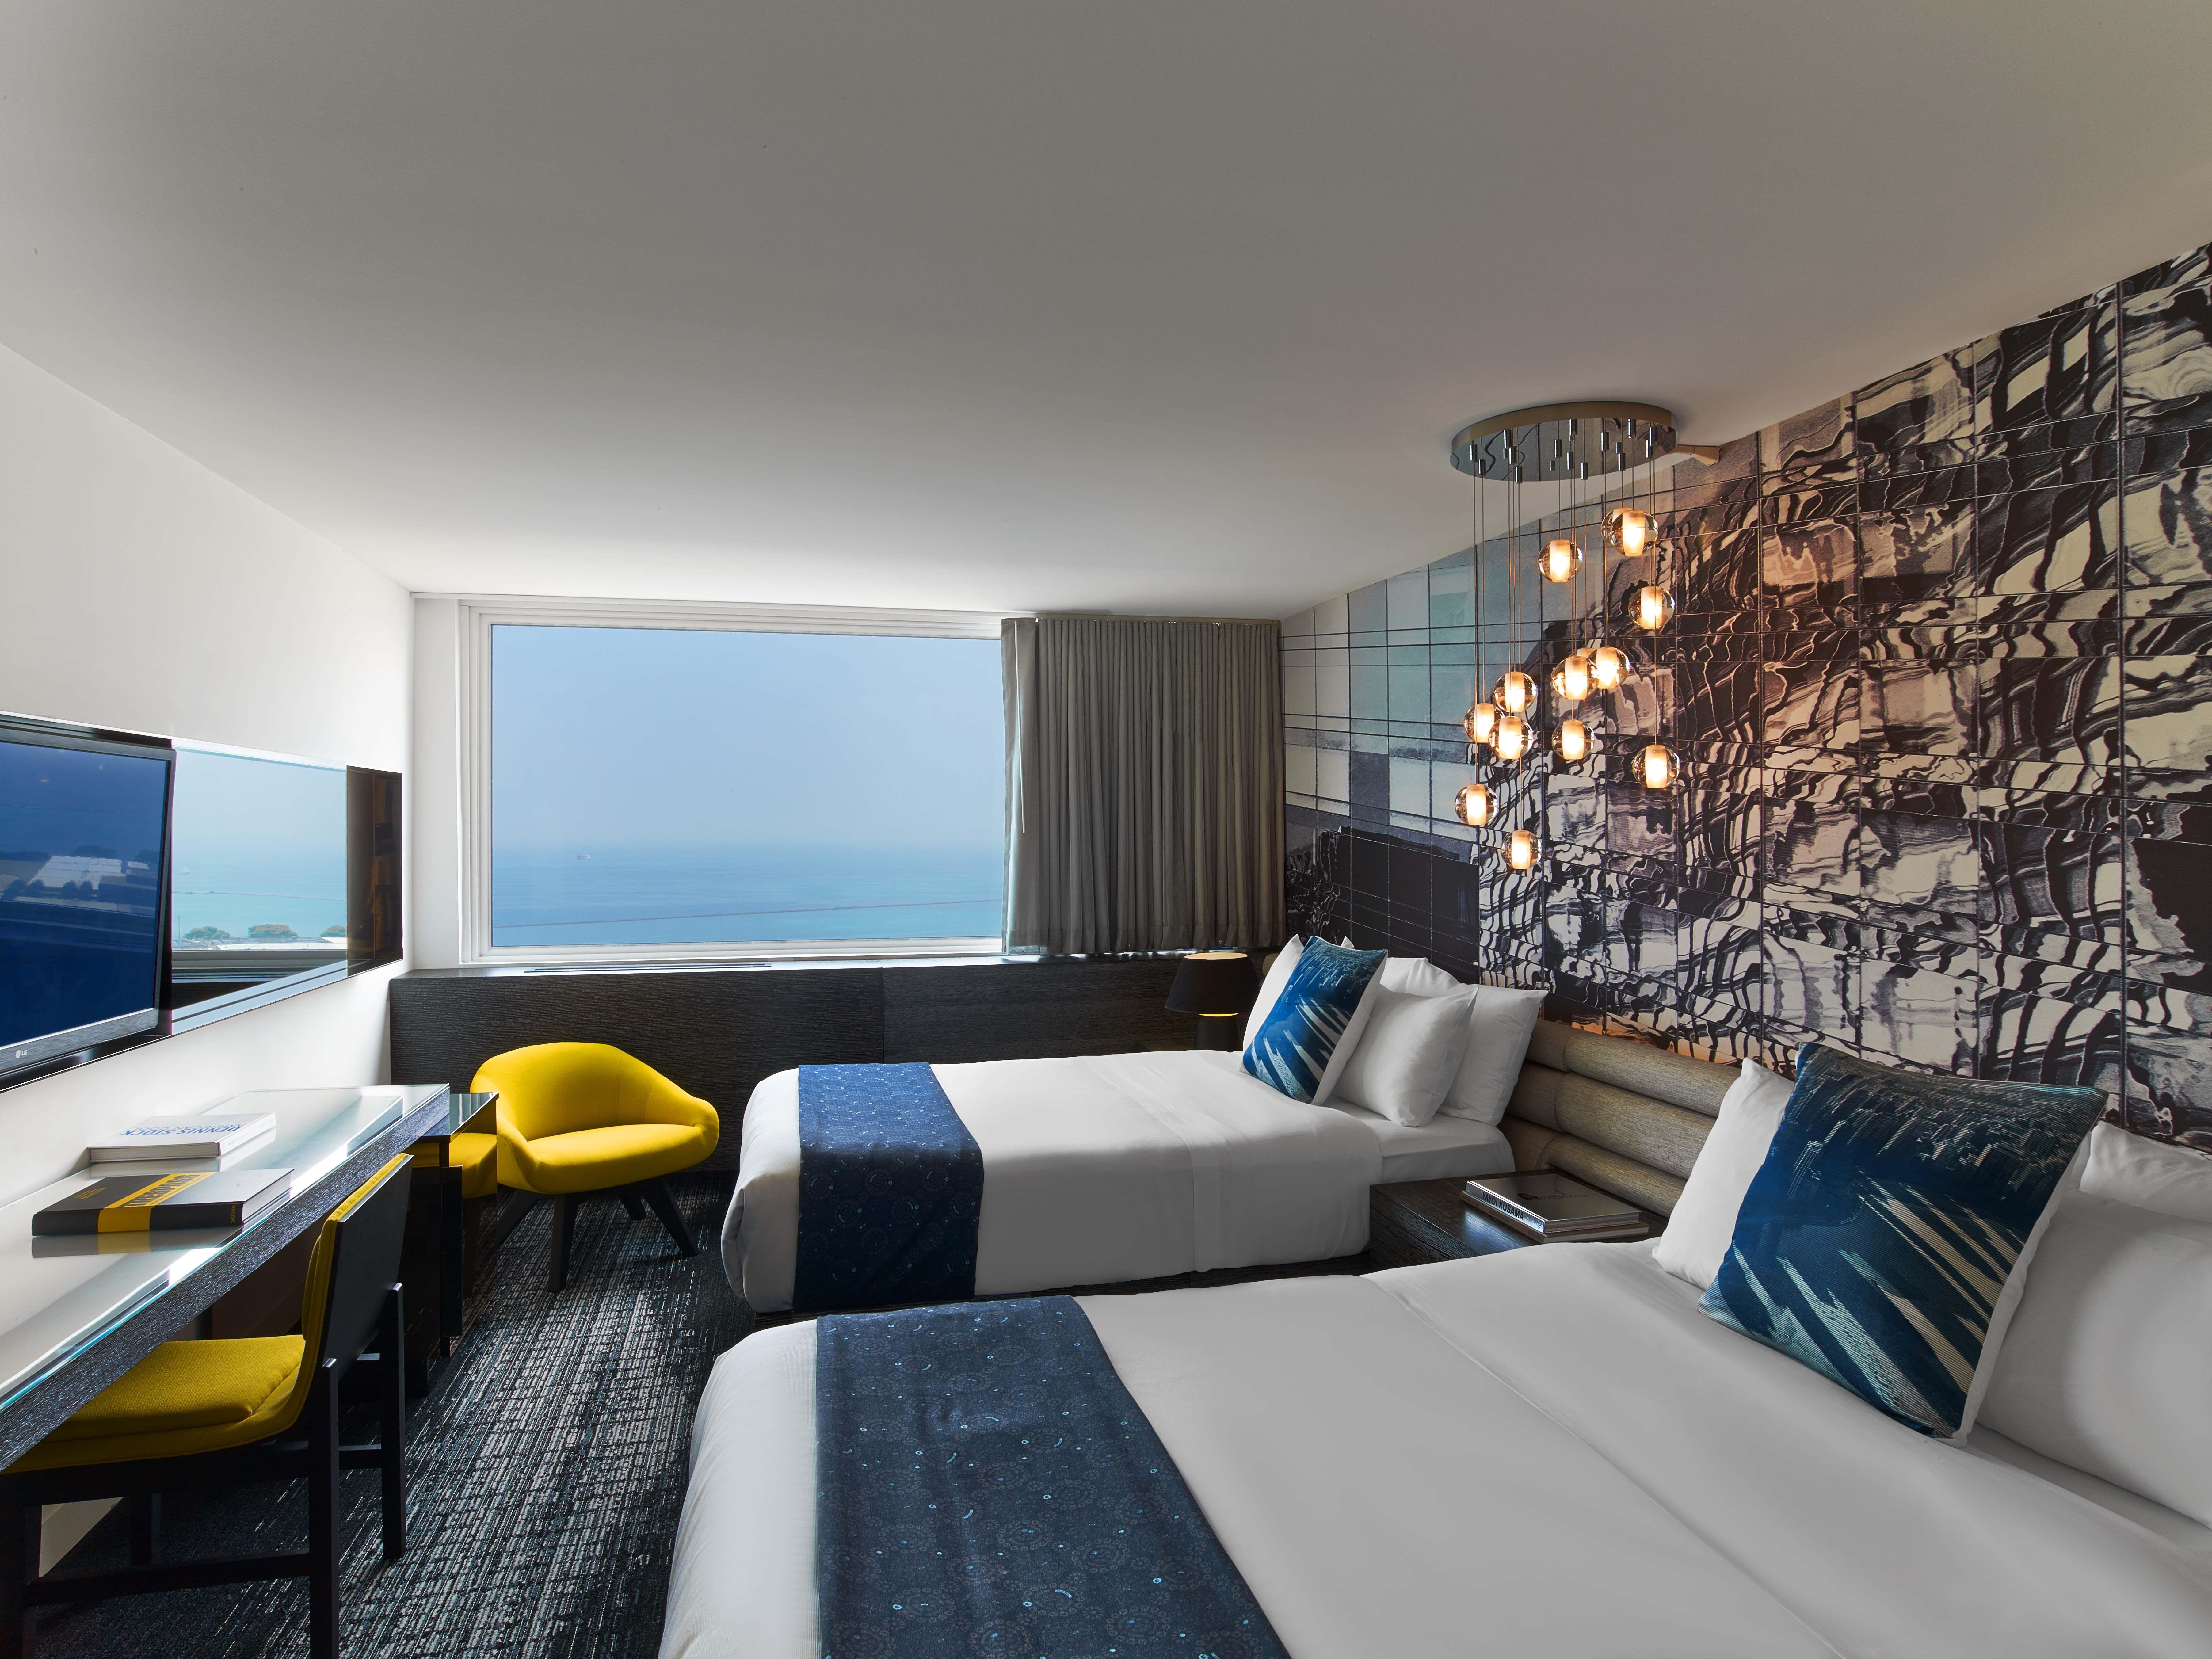 The W Lakeshore Hotel, IL. Design Firm Meyer Davis. Lounge